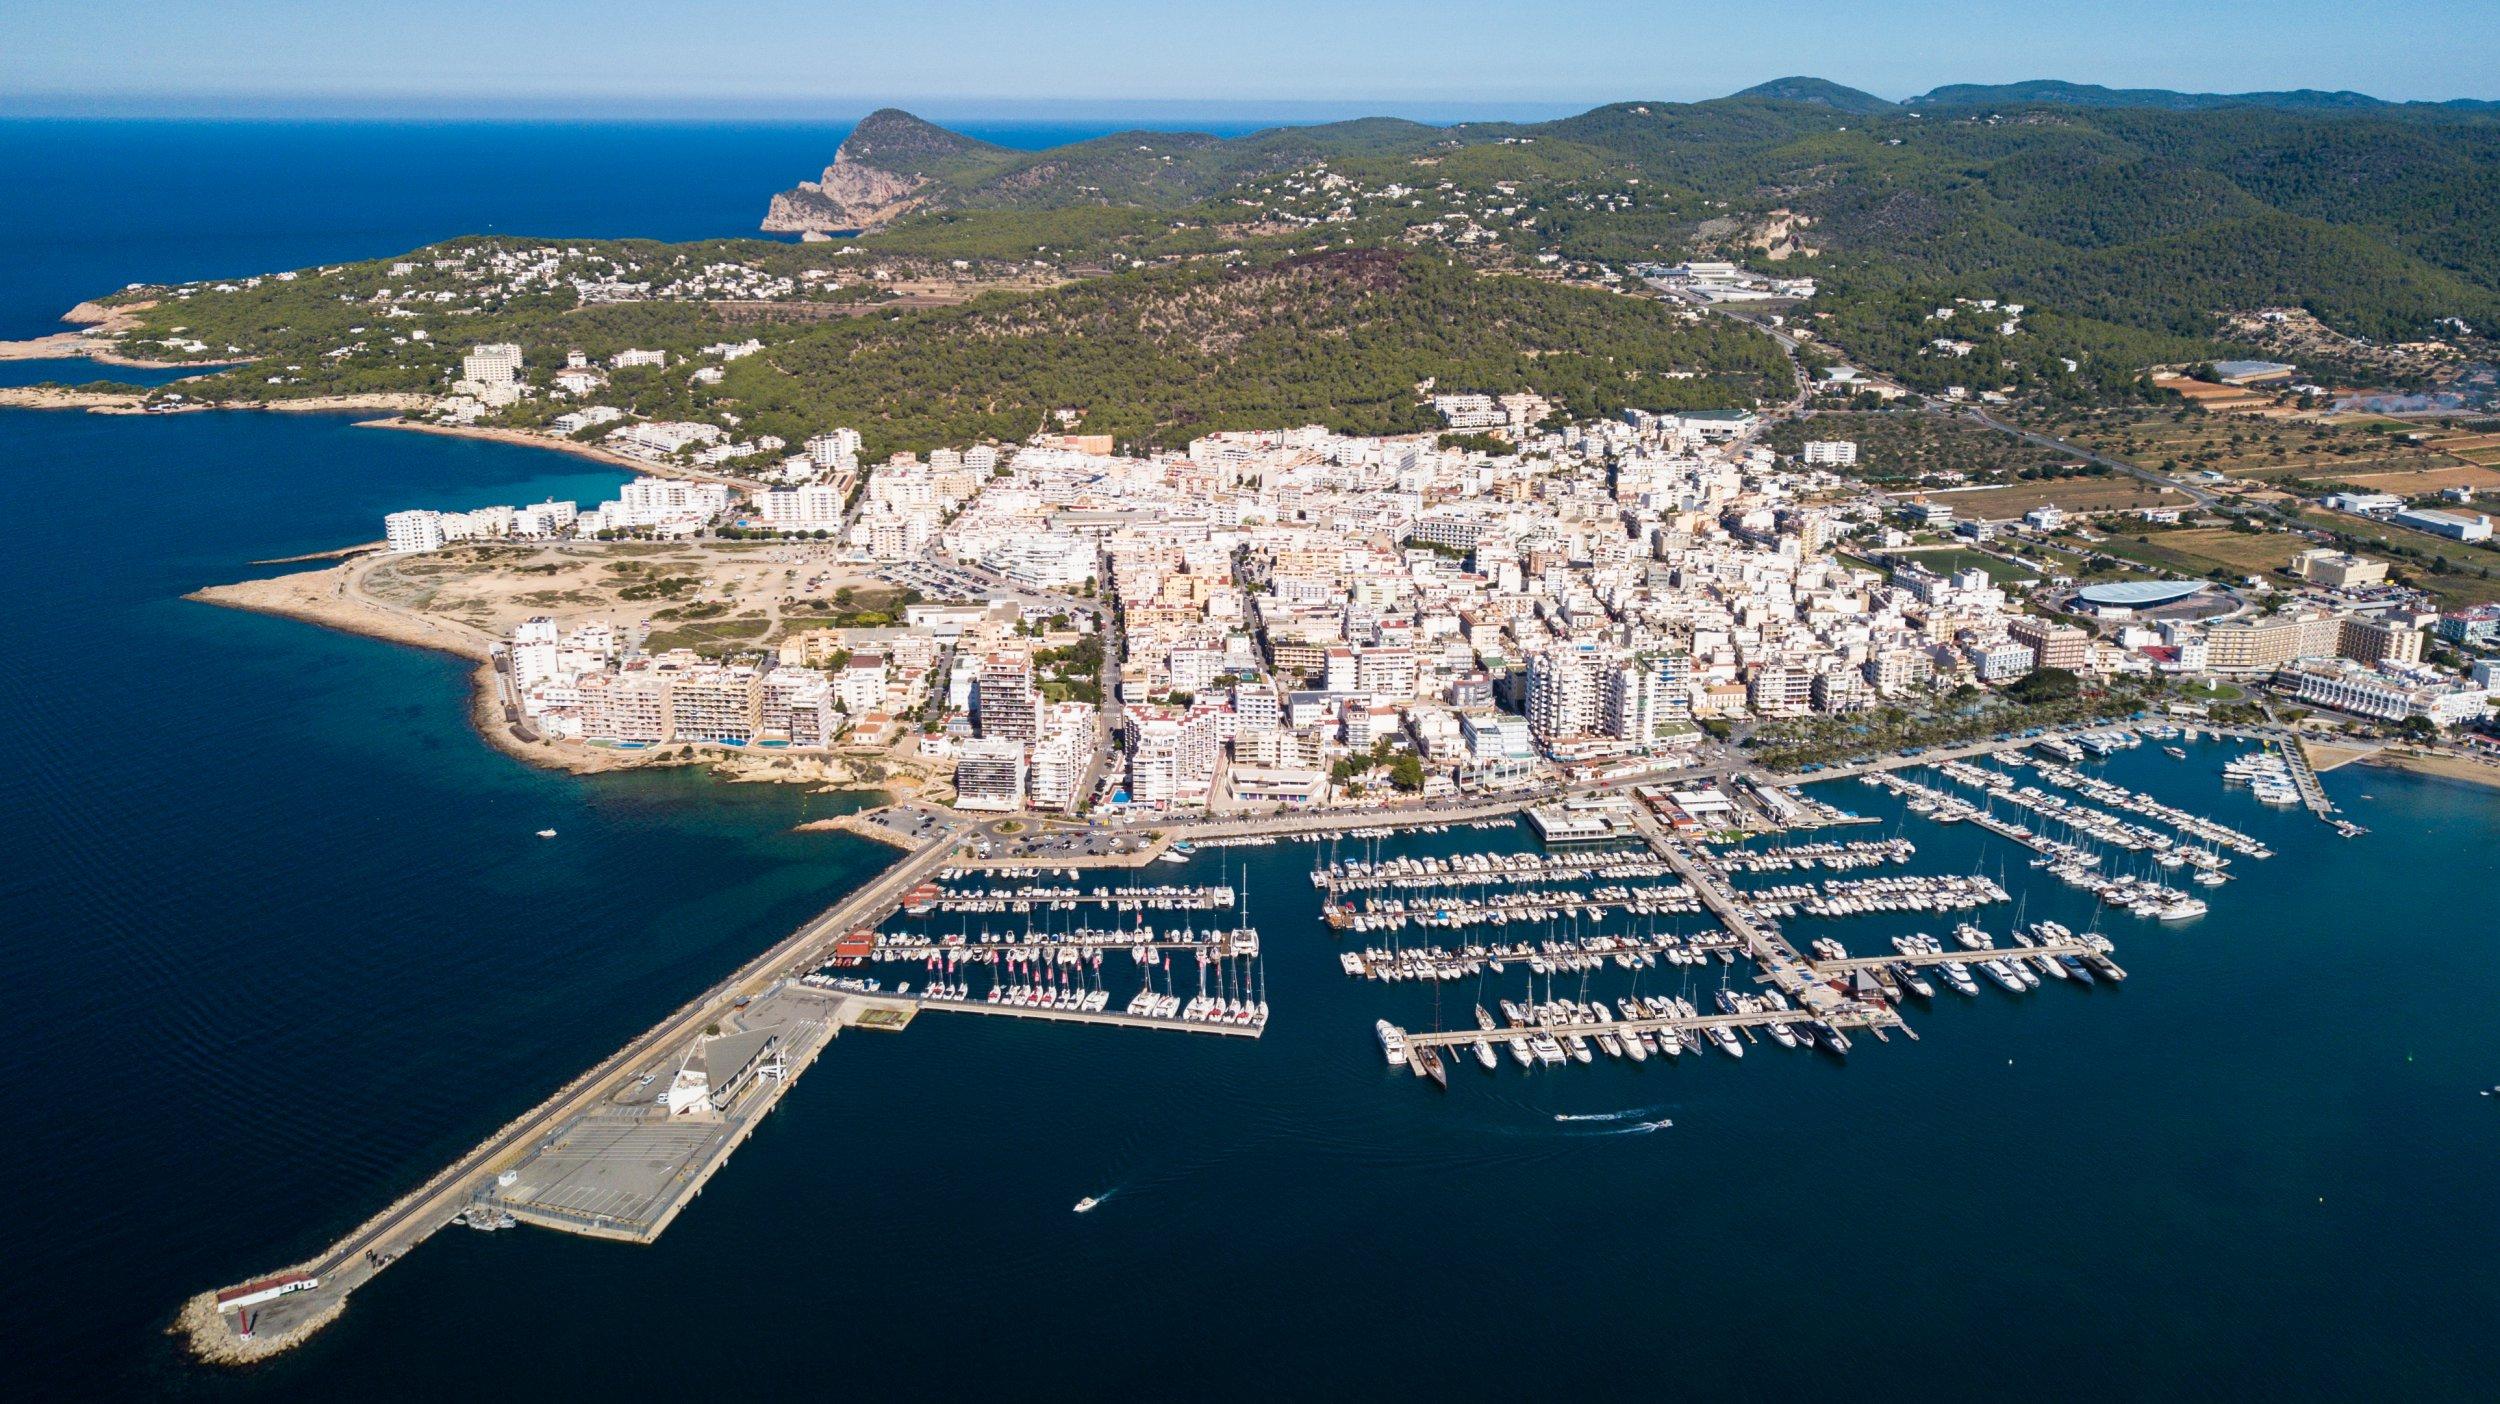 British man's body found floating in Ibiza port